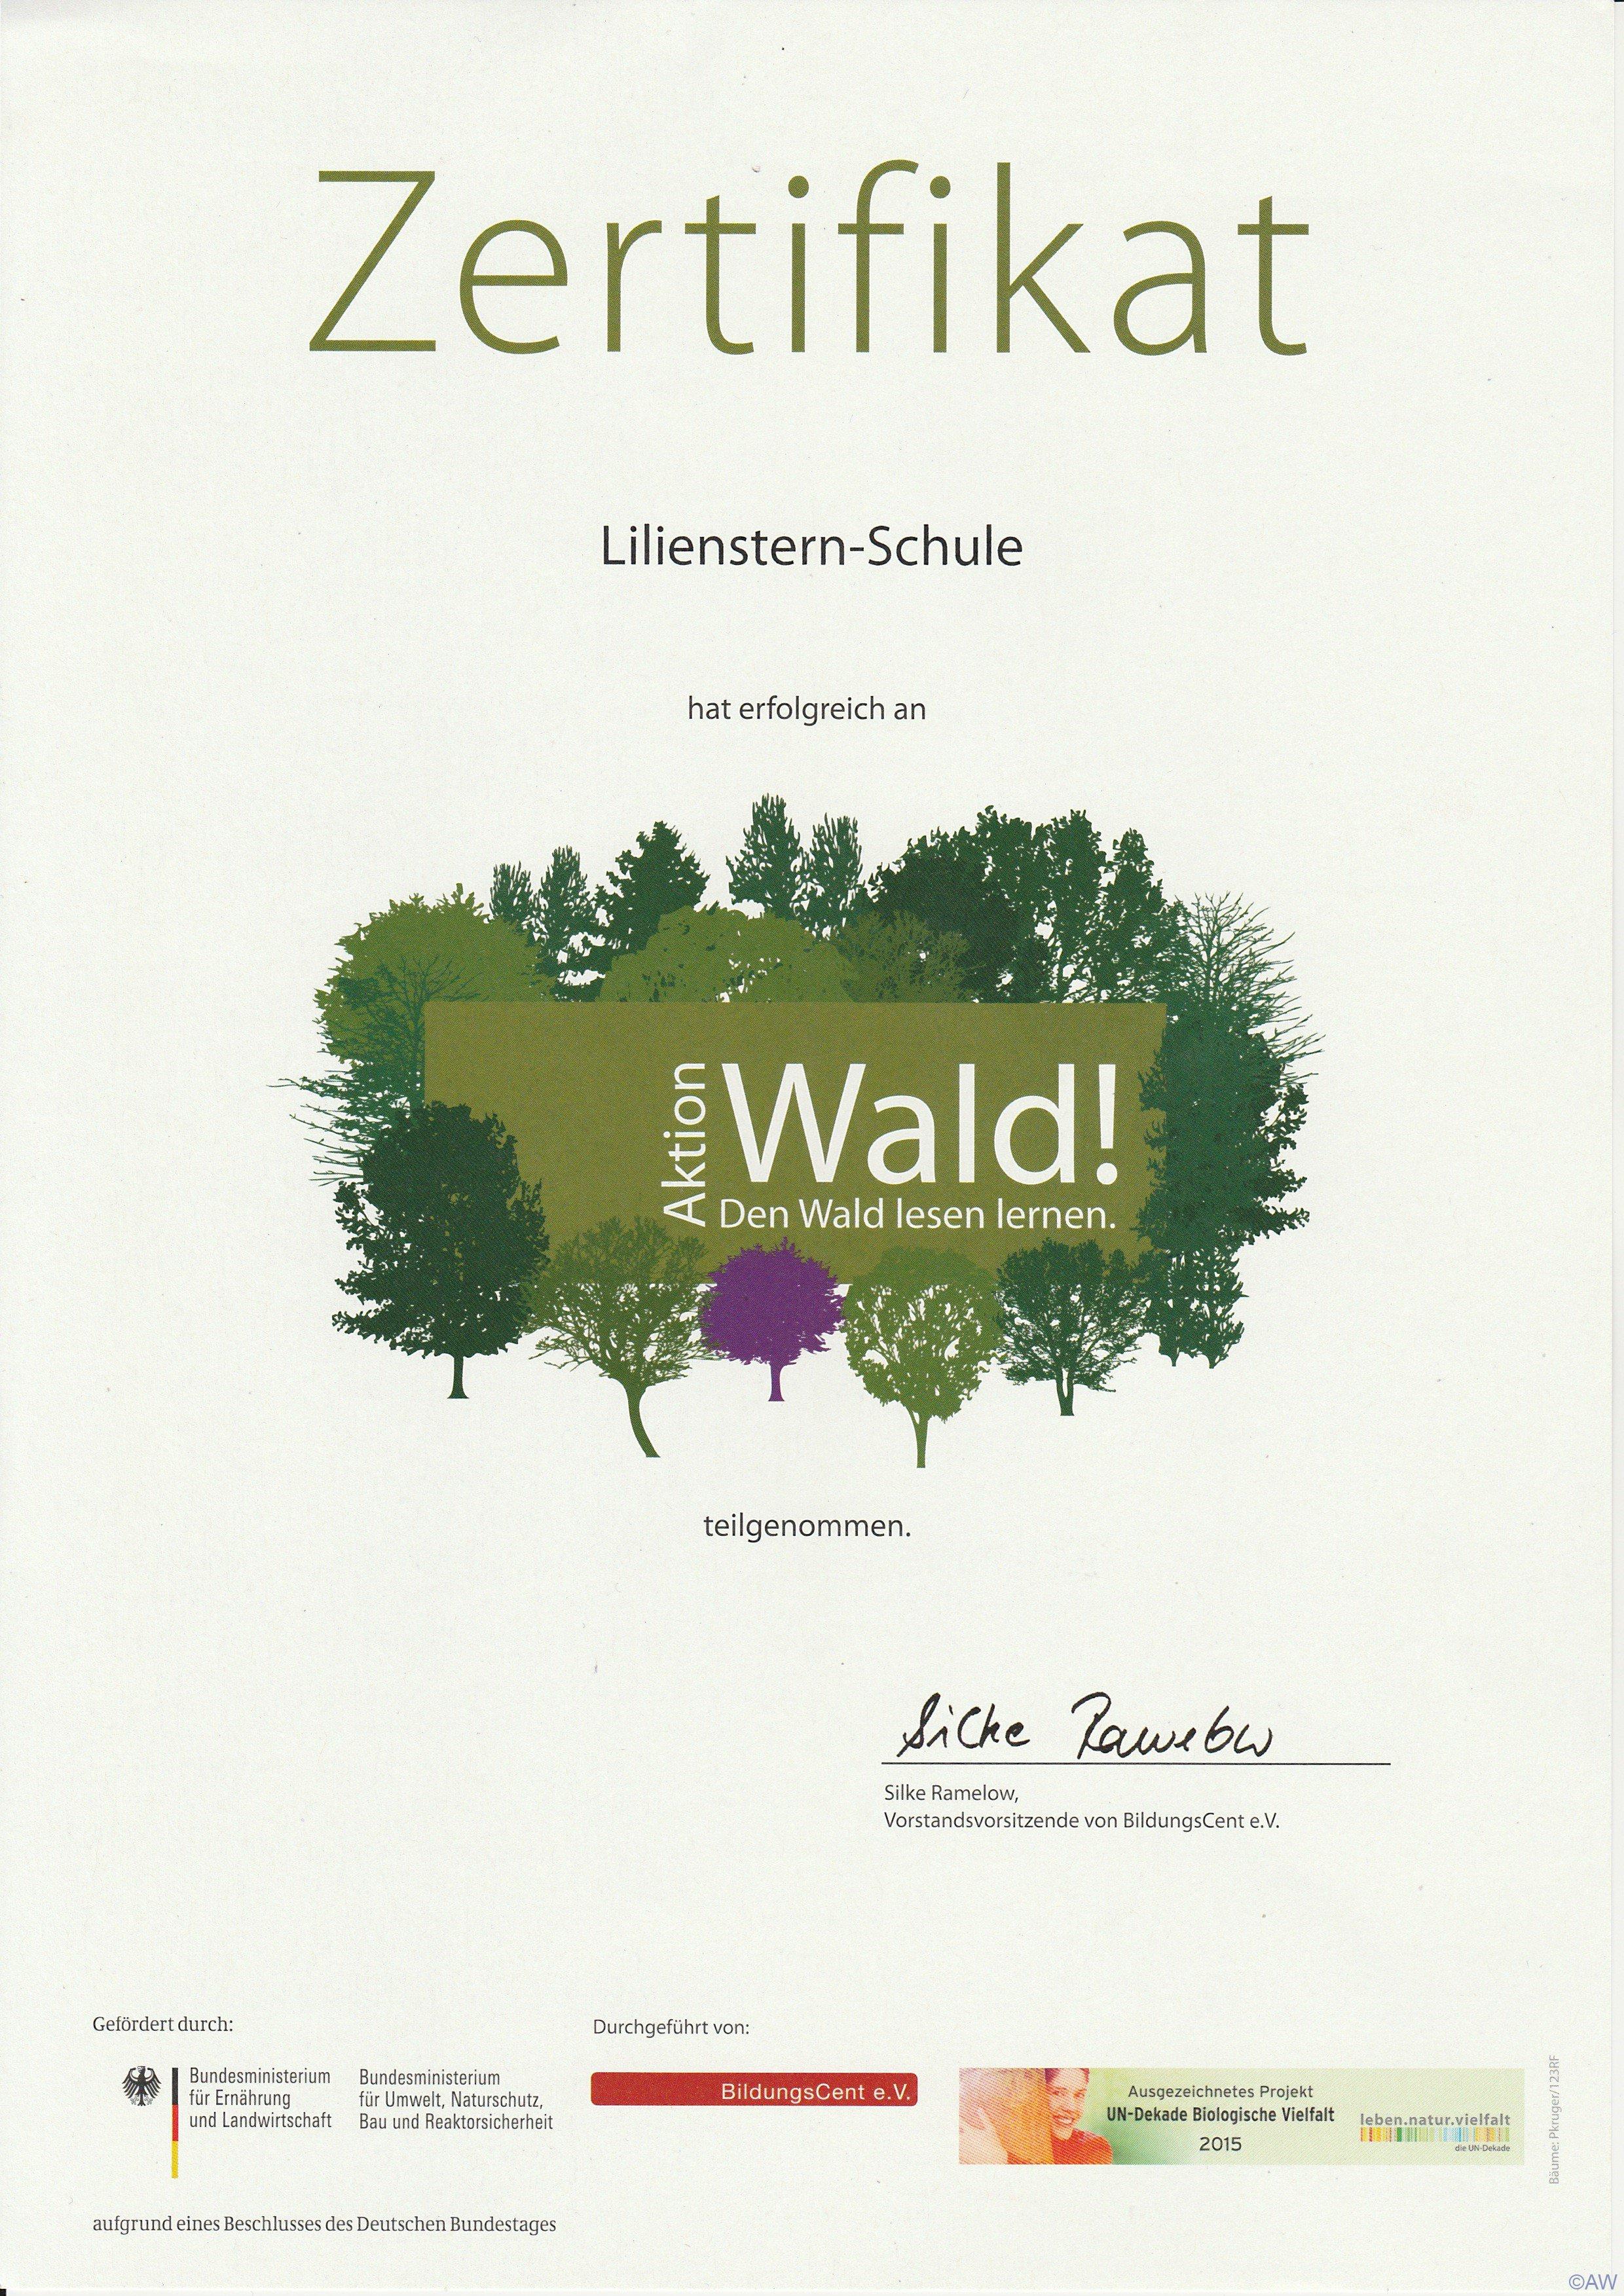 zertifikat-aktion-wald